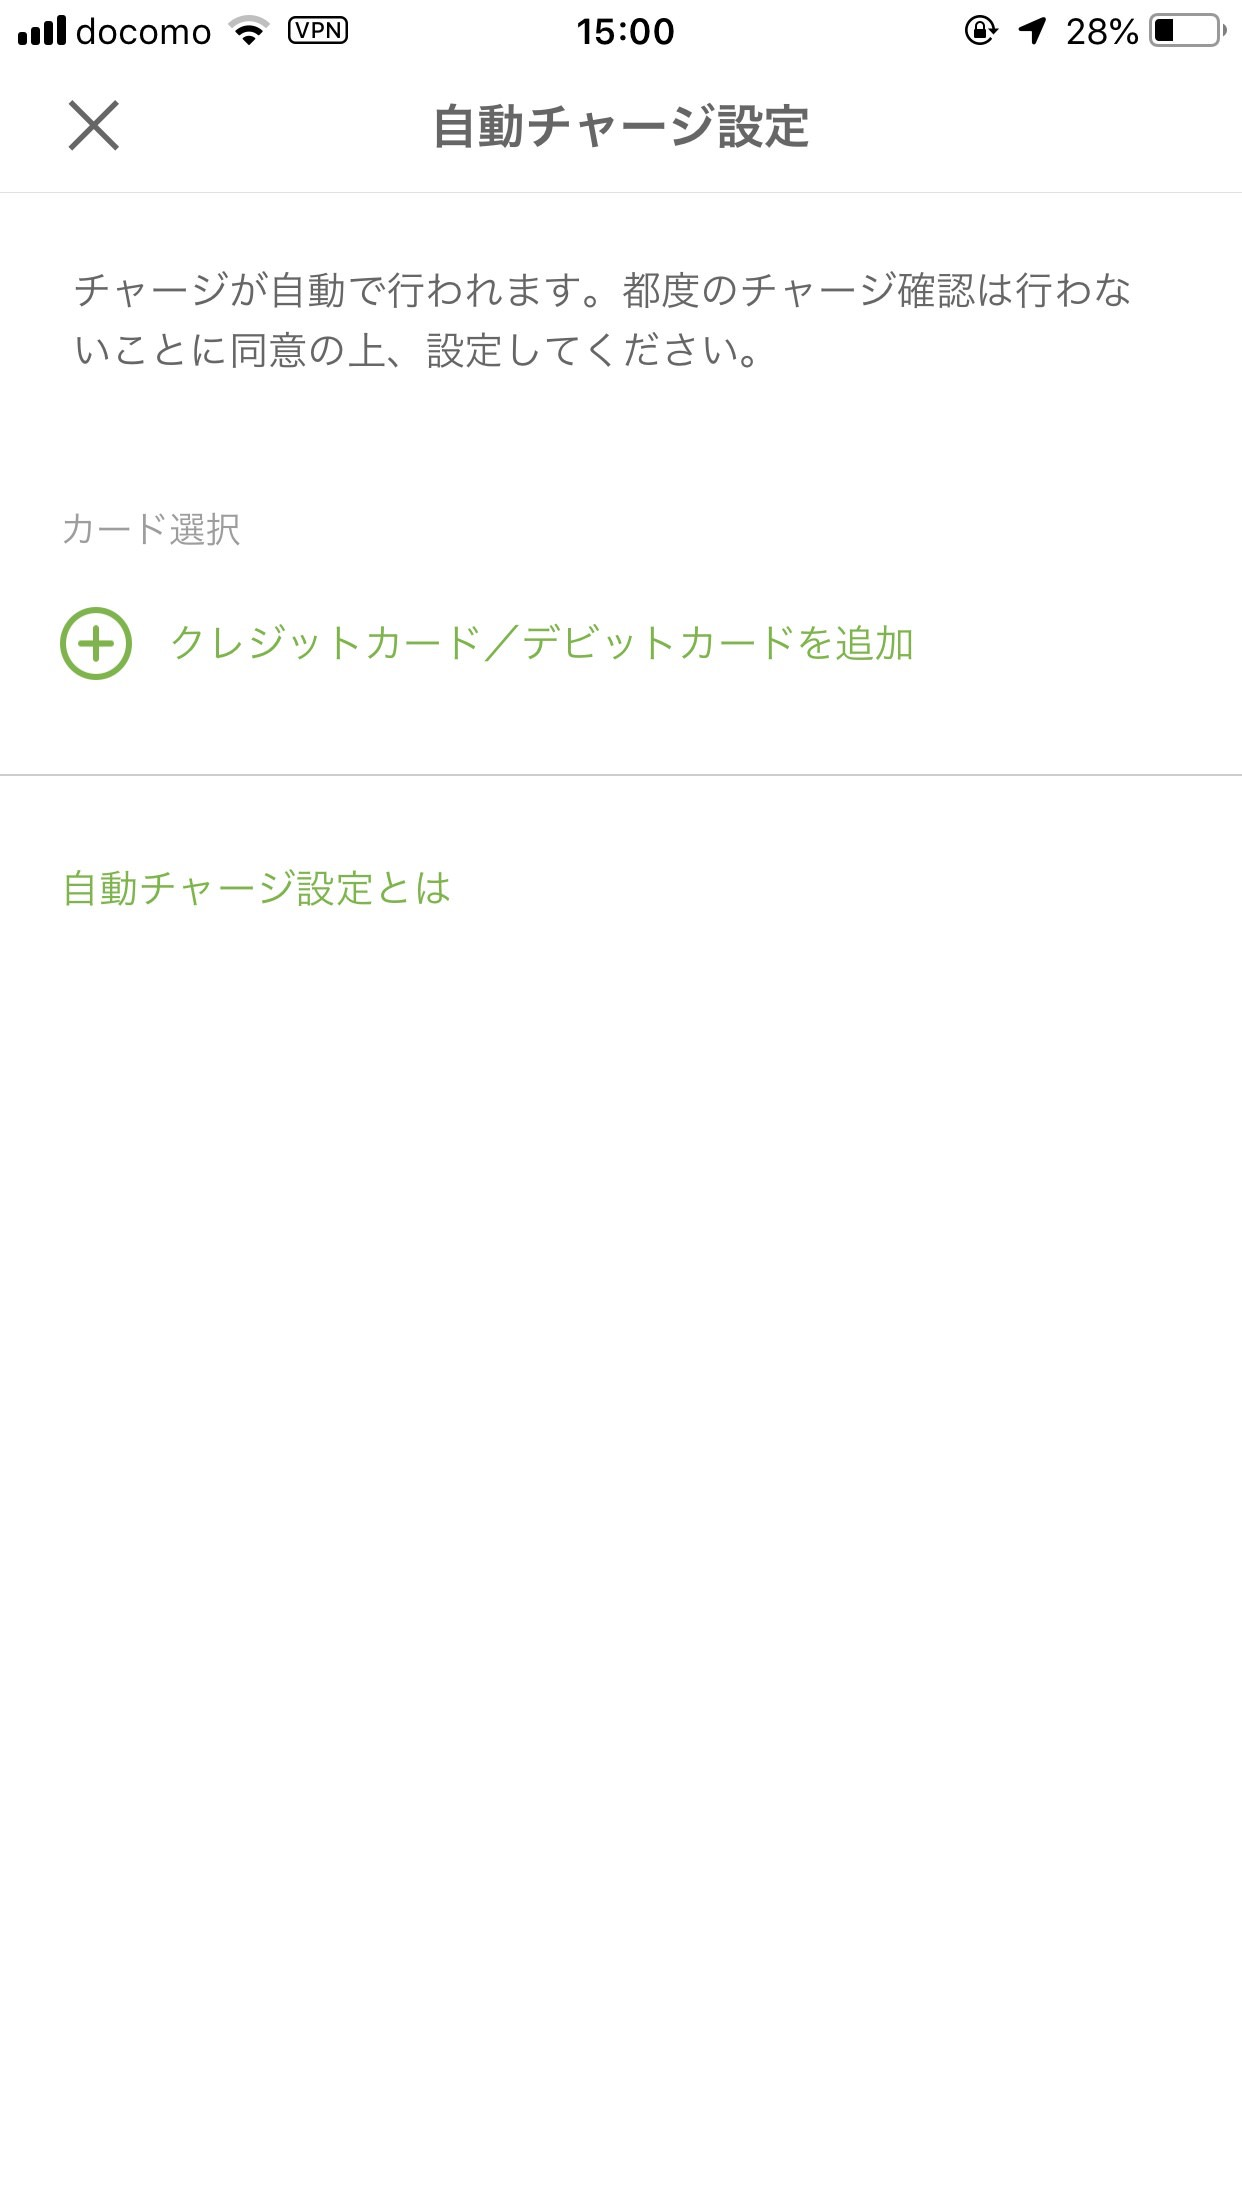 【Kyash】クレジットカードからチャージする方法【2種類】